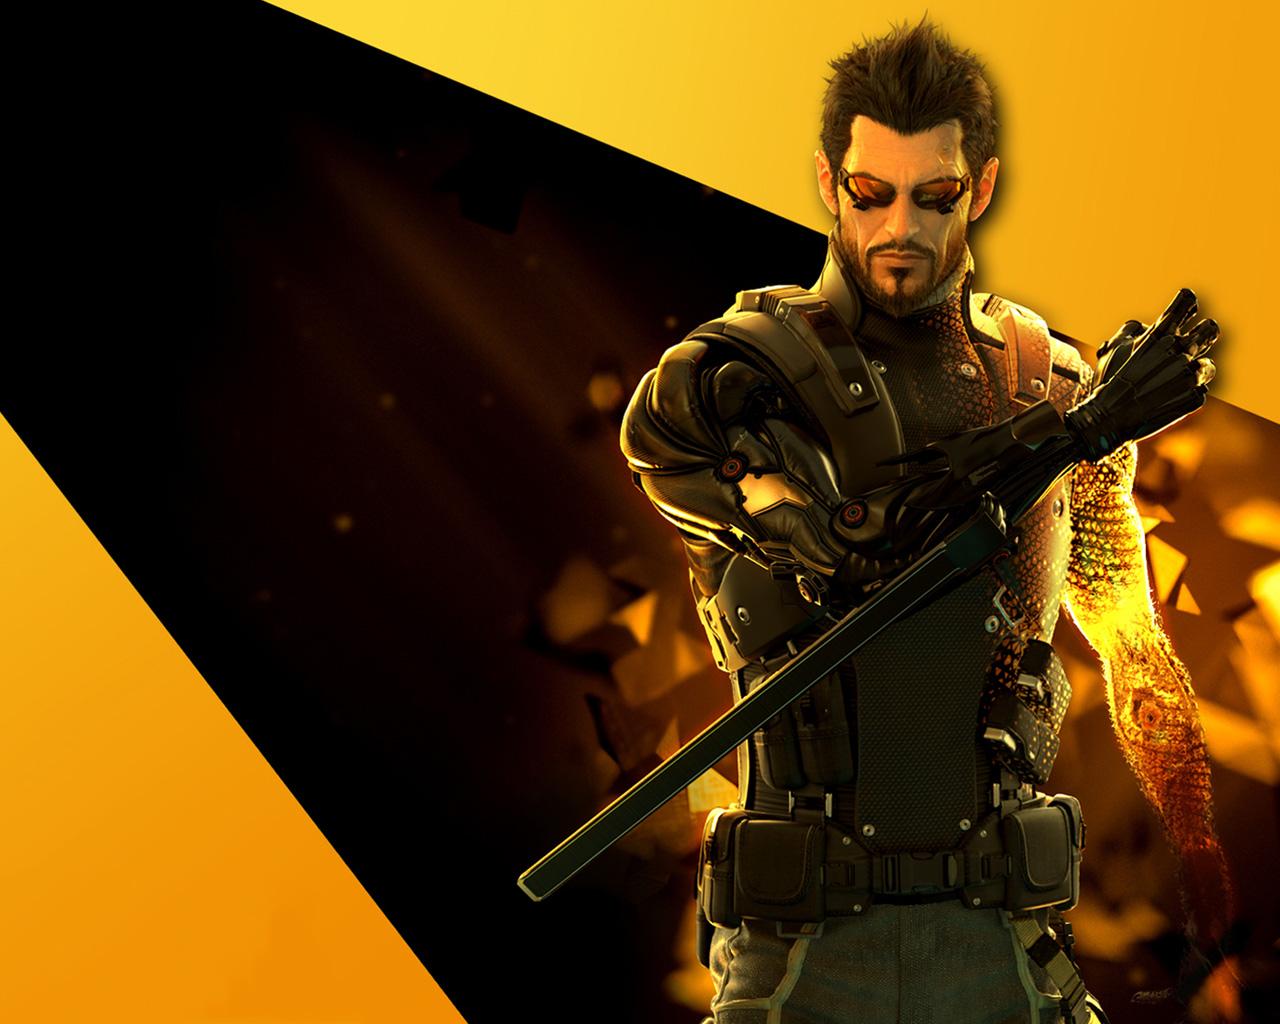 Deus Ex: Human Revolution Wallpaper in 1280x1024